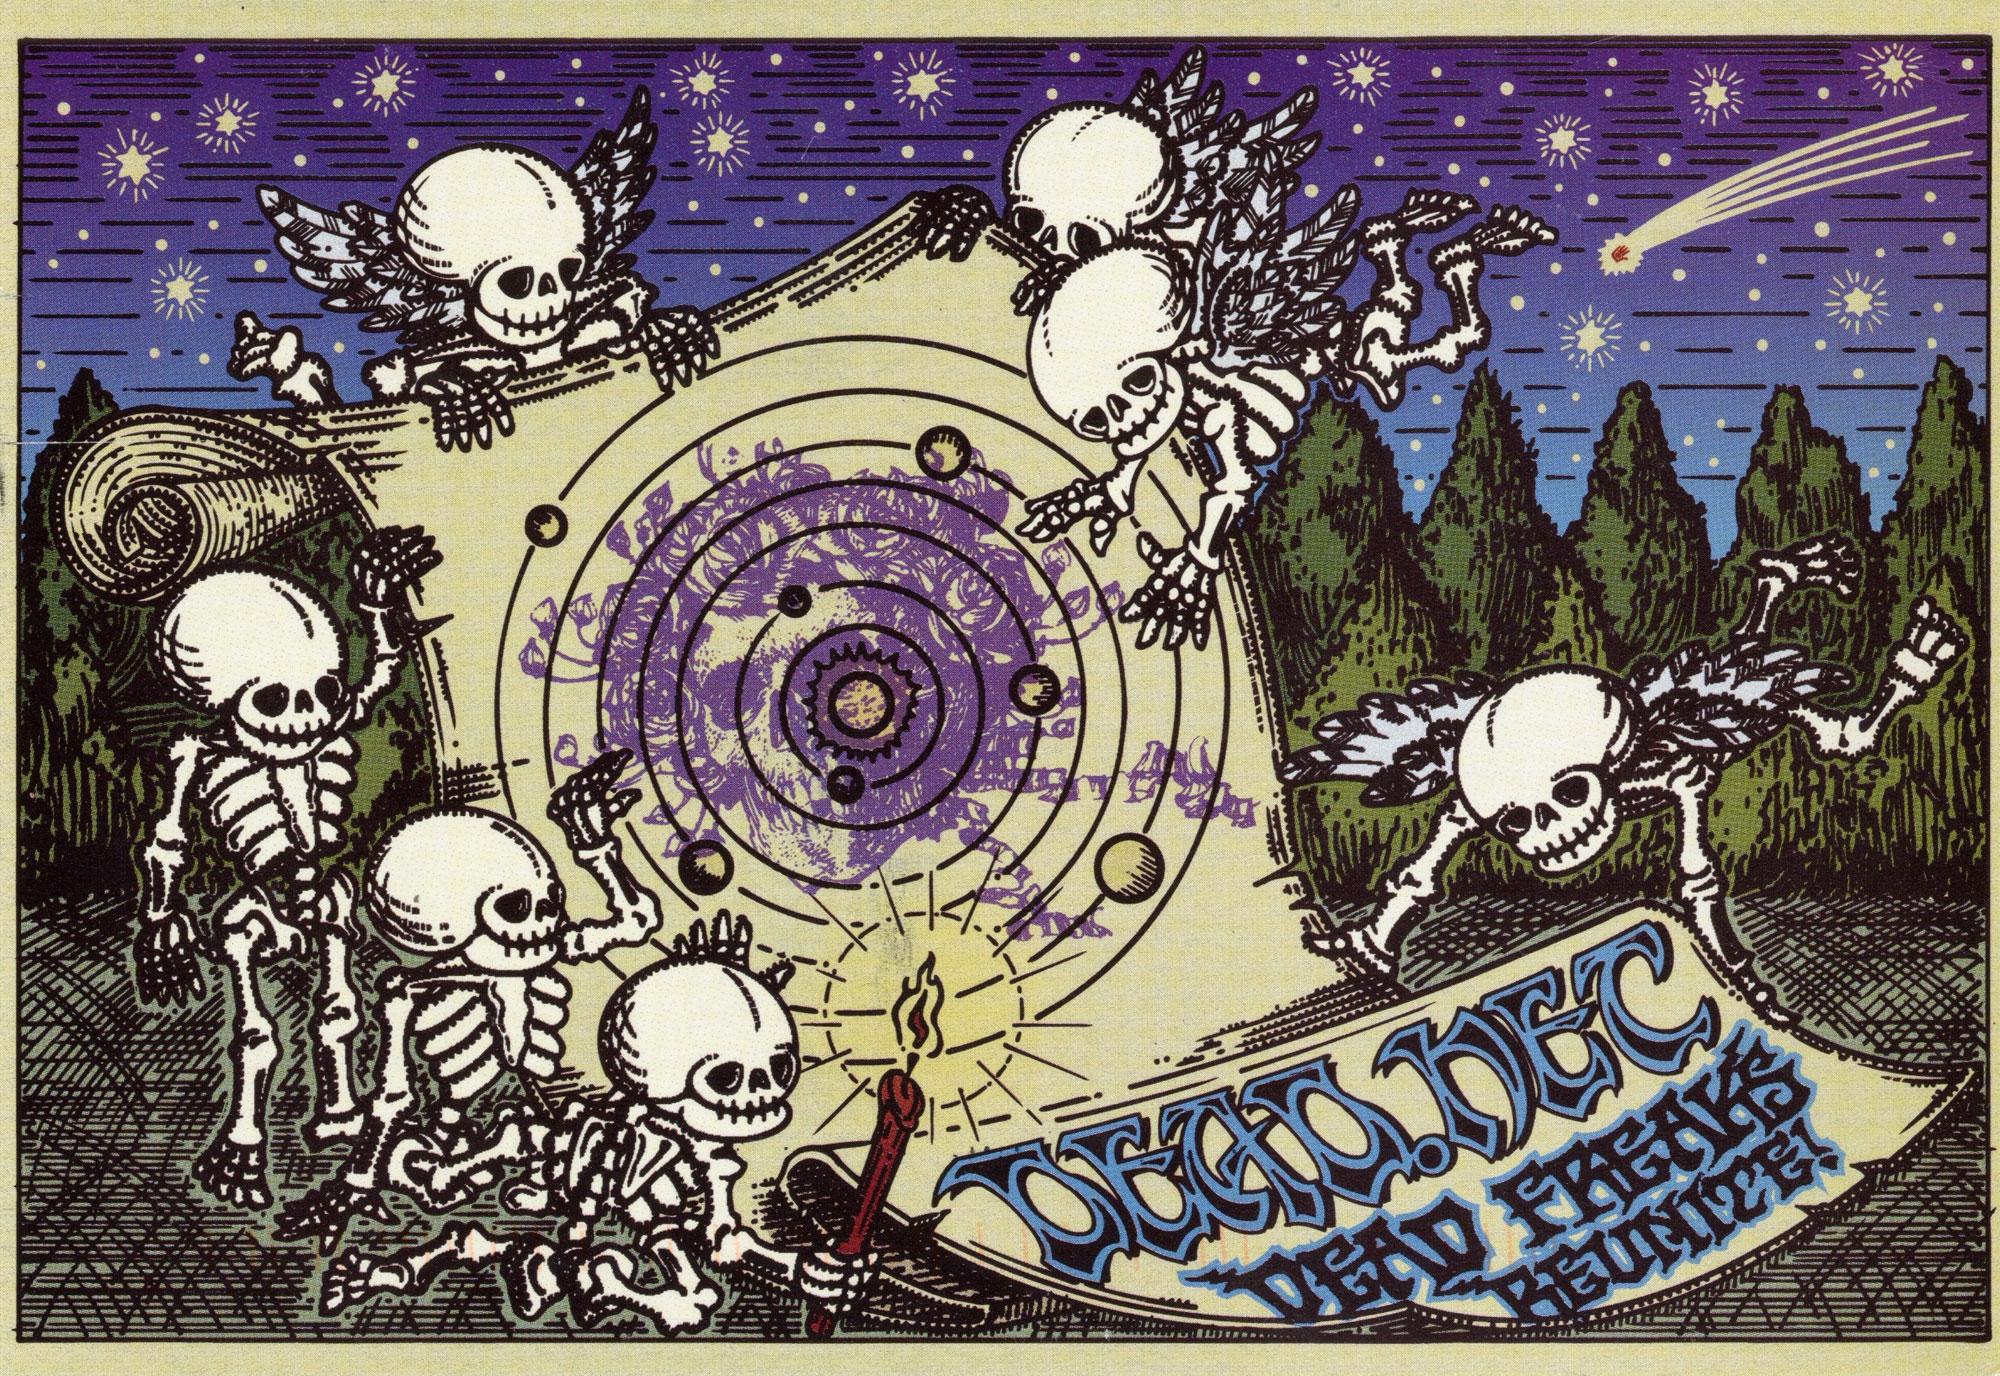 Dead Freaks Reunite Poster Grateful Dead